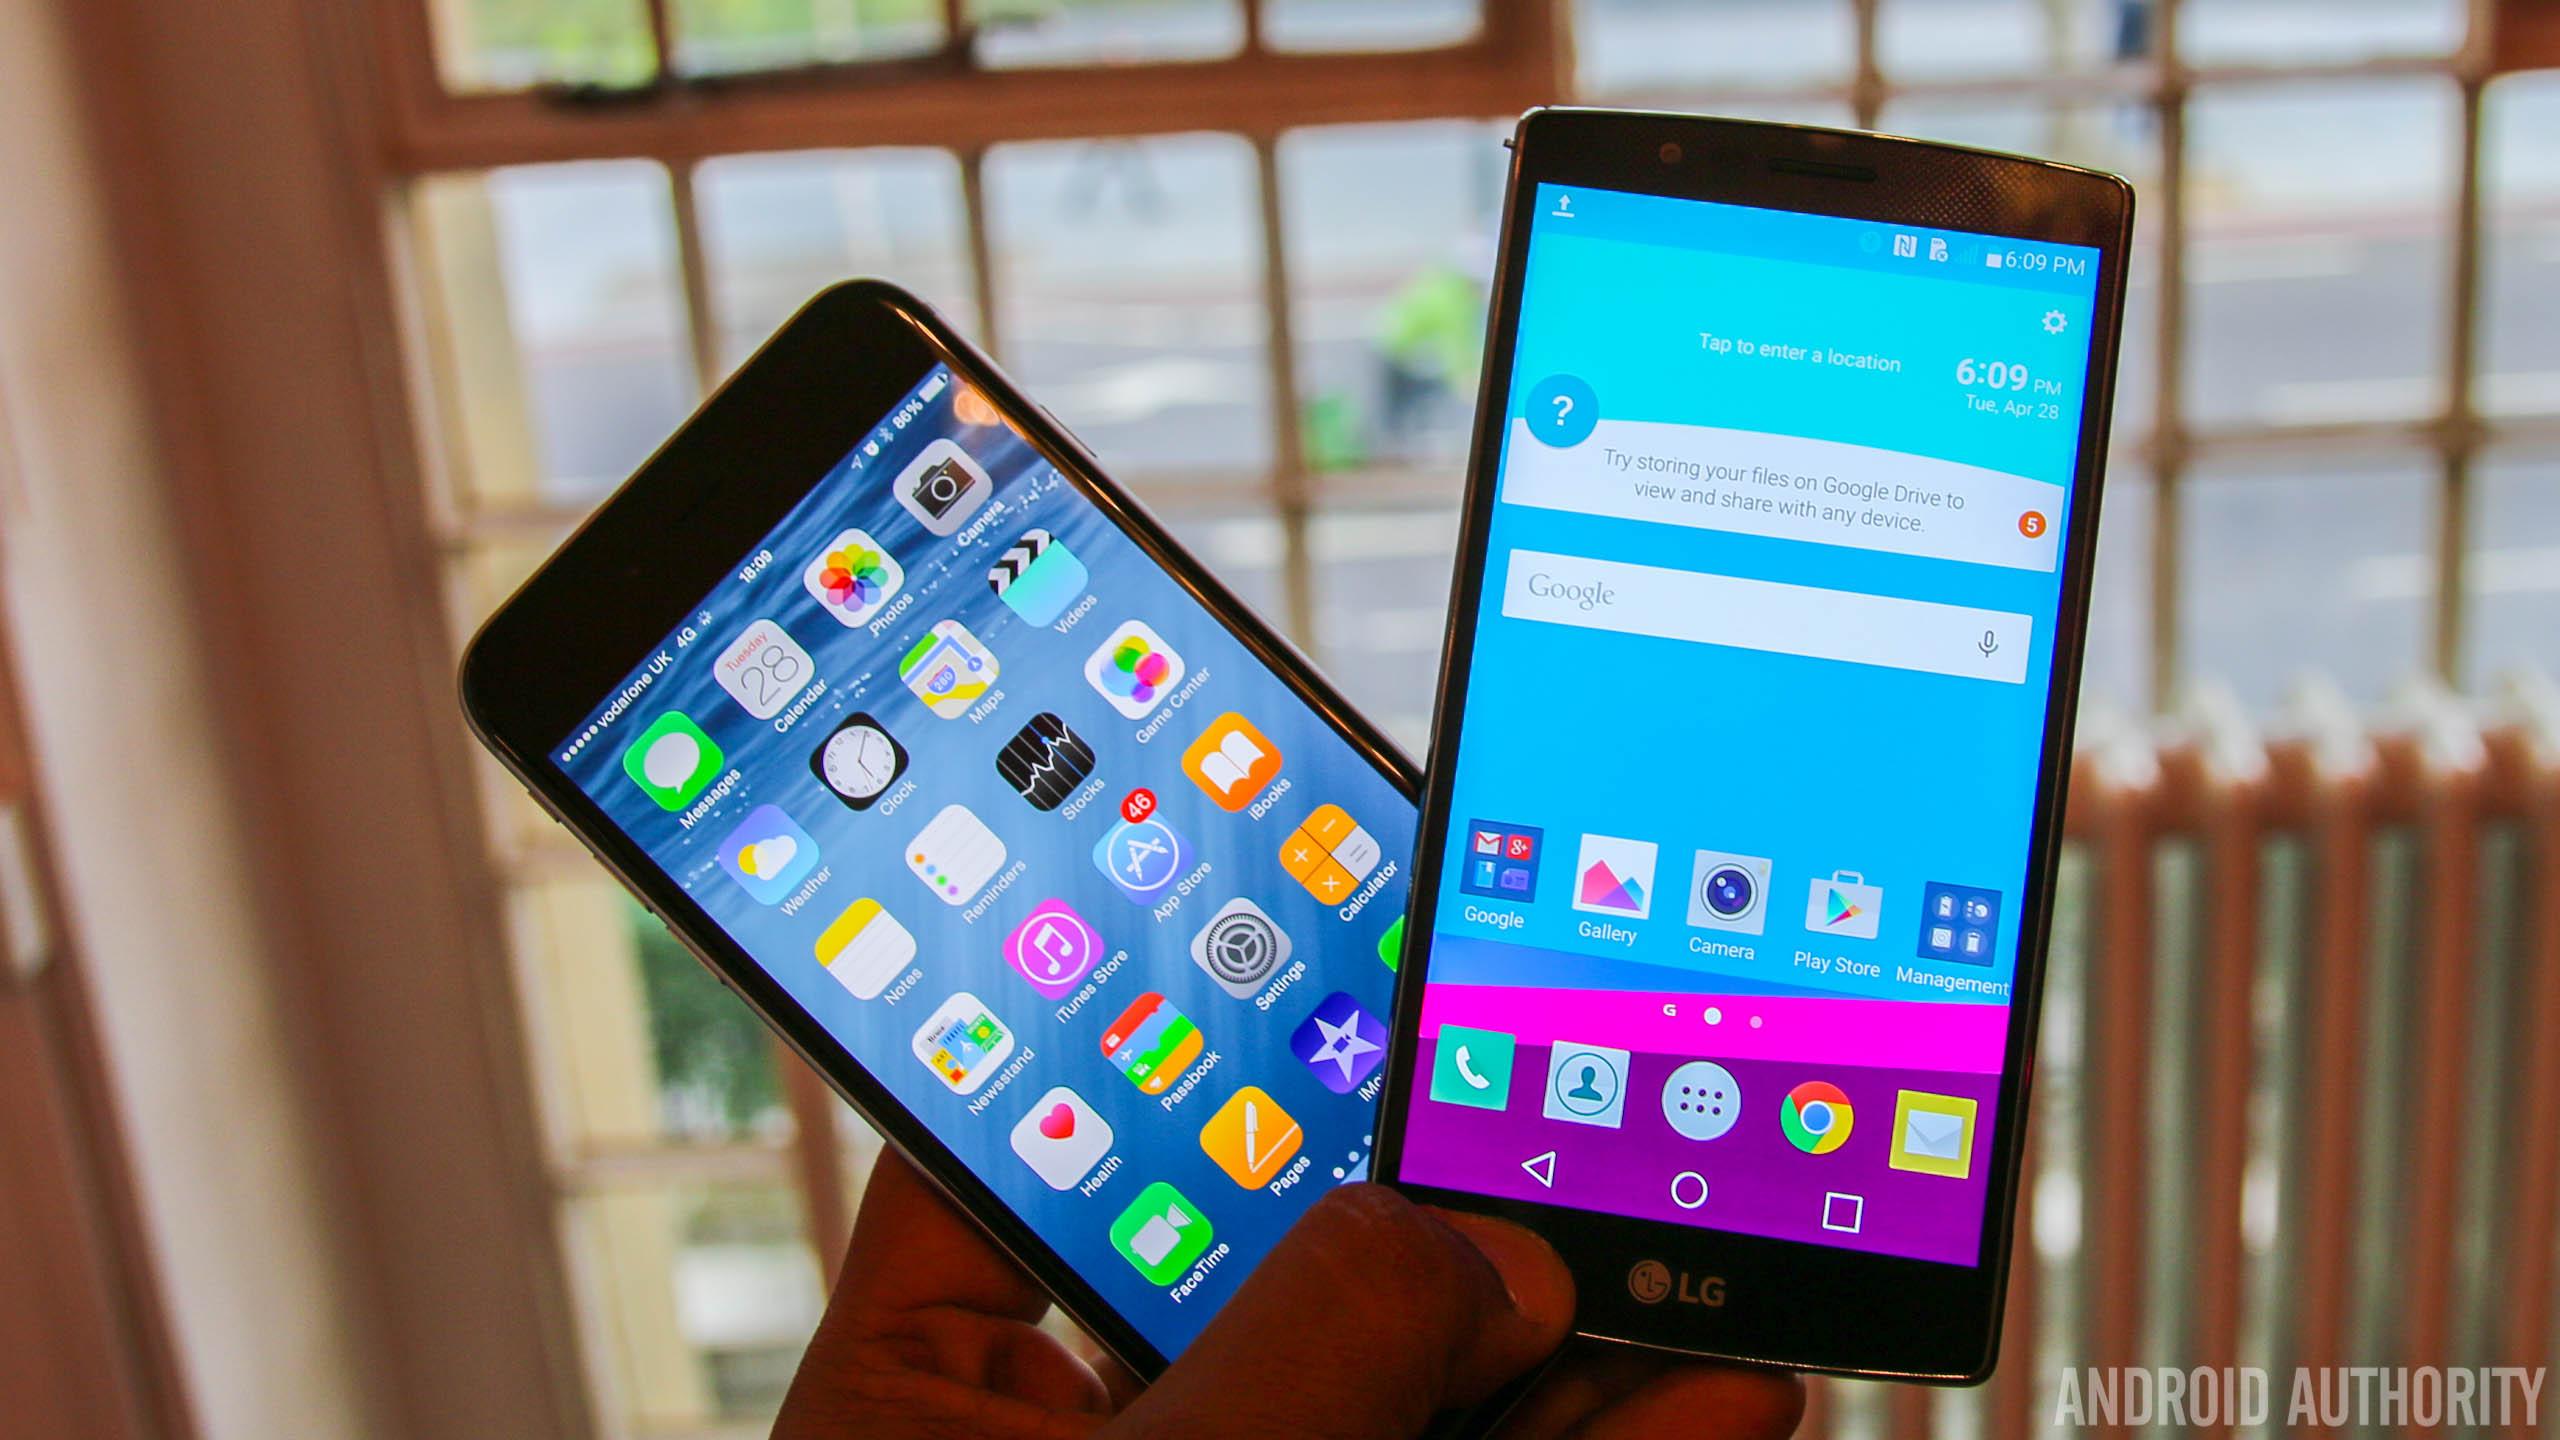 LG-G4-vs-Apple-iPhone-6-Plus-2